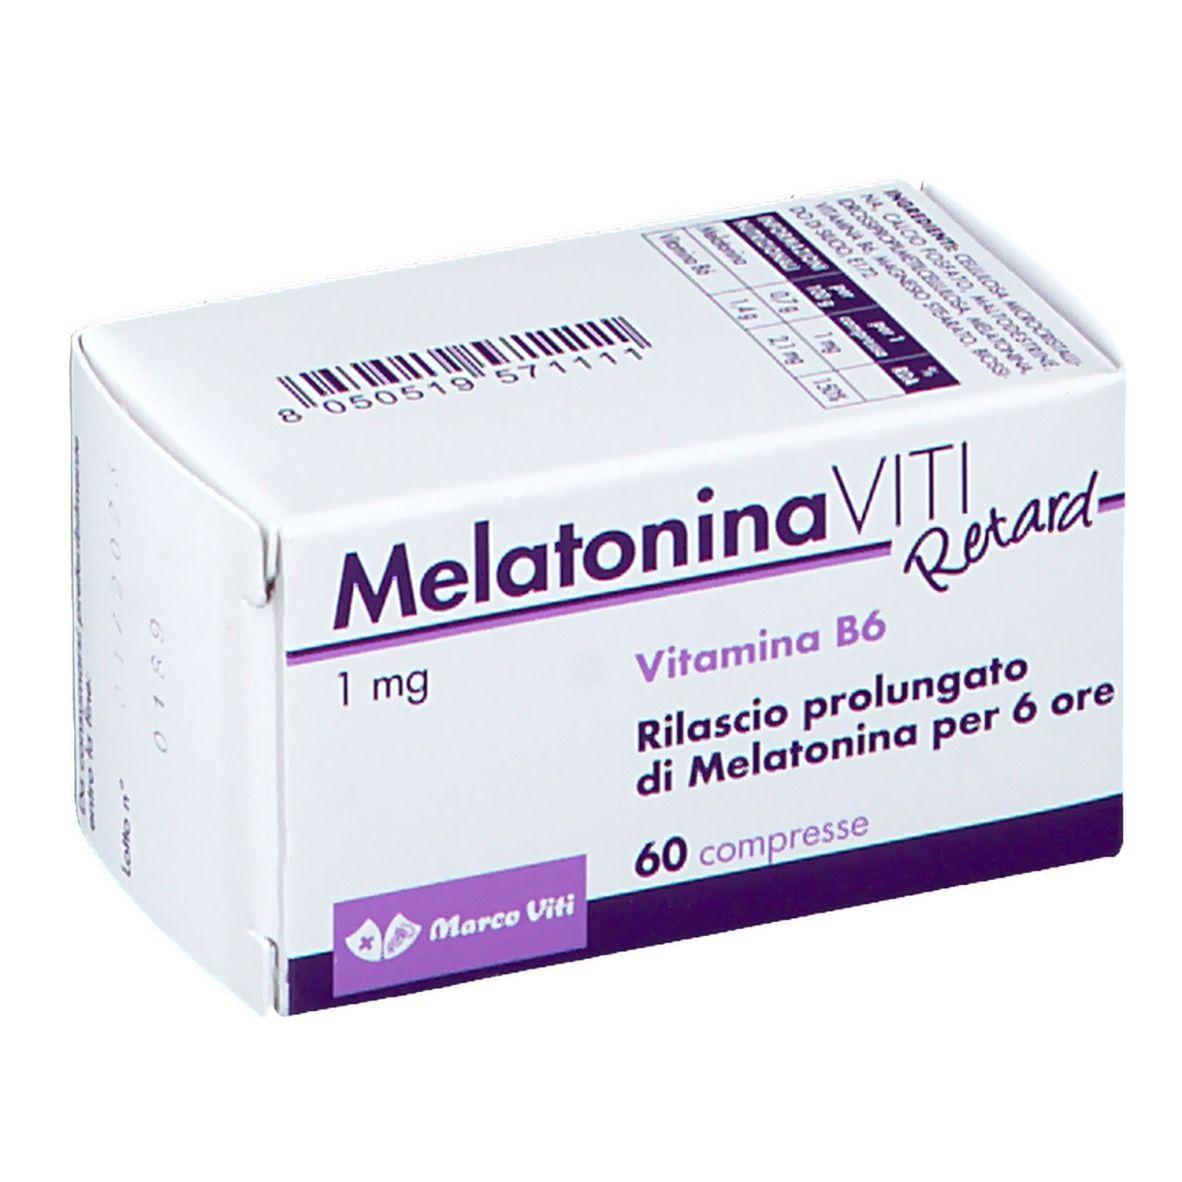 Melatonina Viti Retard 60 Pz Shop Farmacia It